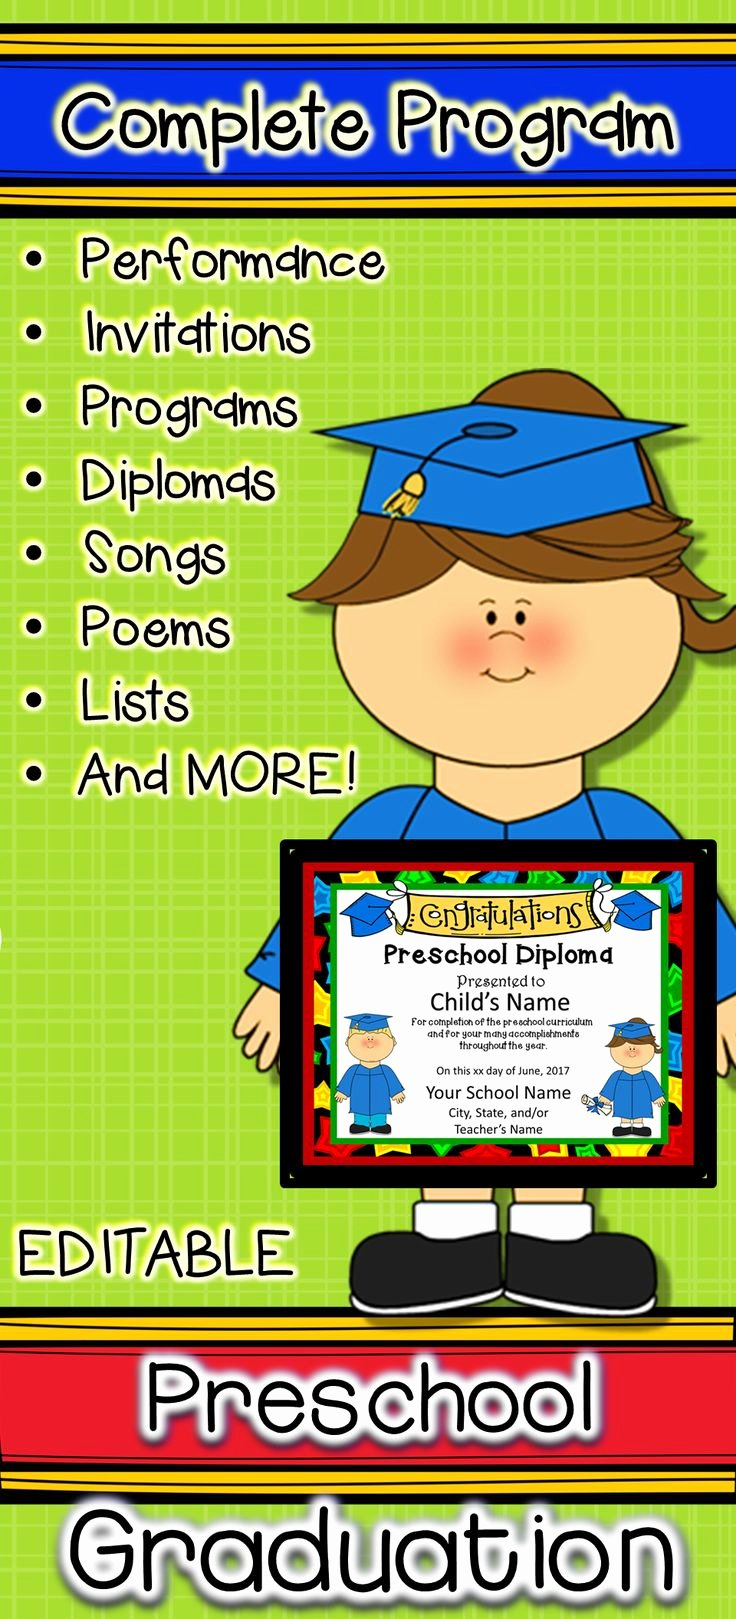 Preschool Graduation Programs Template Beautiful Preschool Graduation Diplomas Invitations and Program